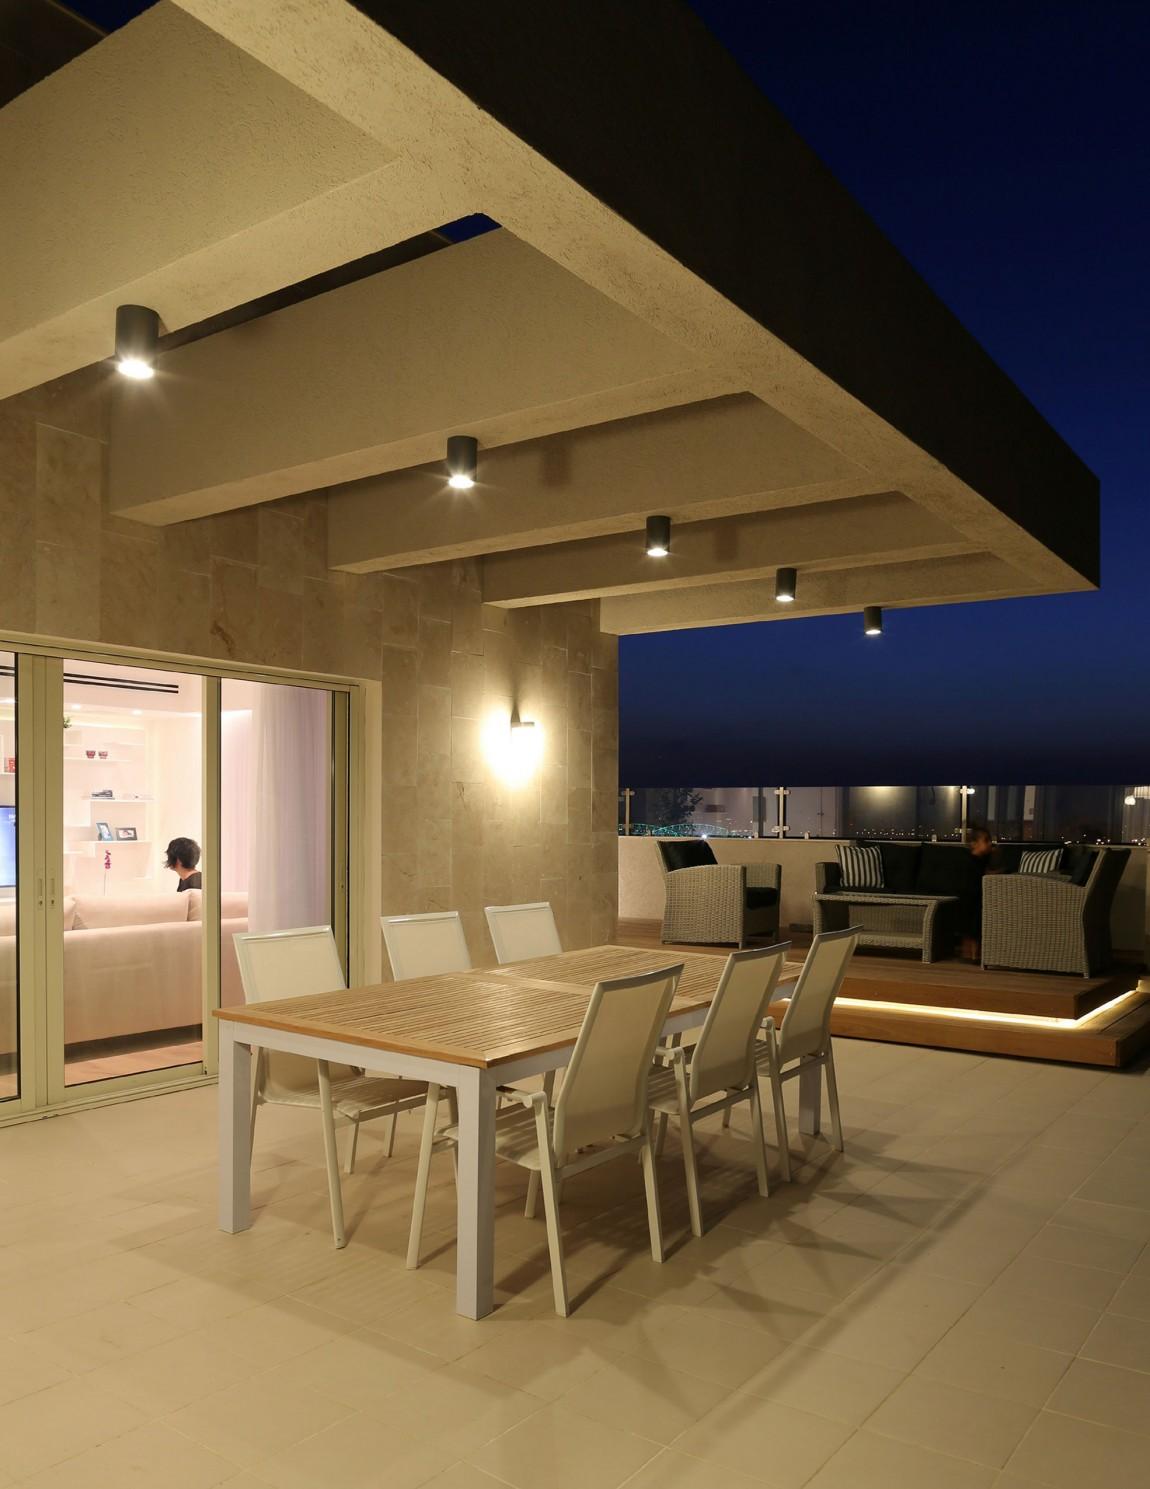 Uređenje stana by Dori Interior Design  MojStan.net